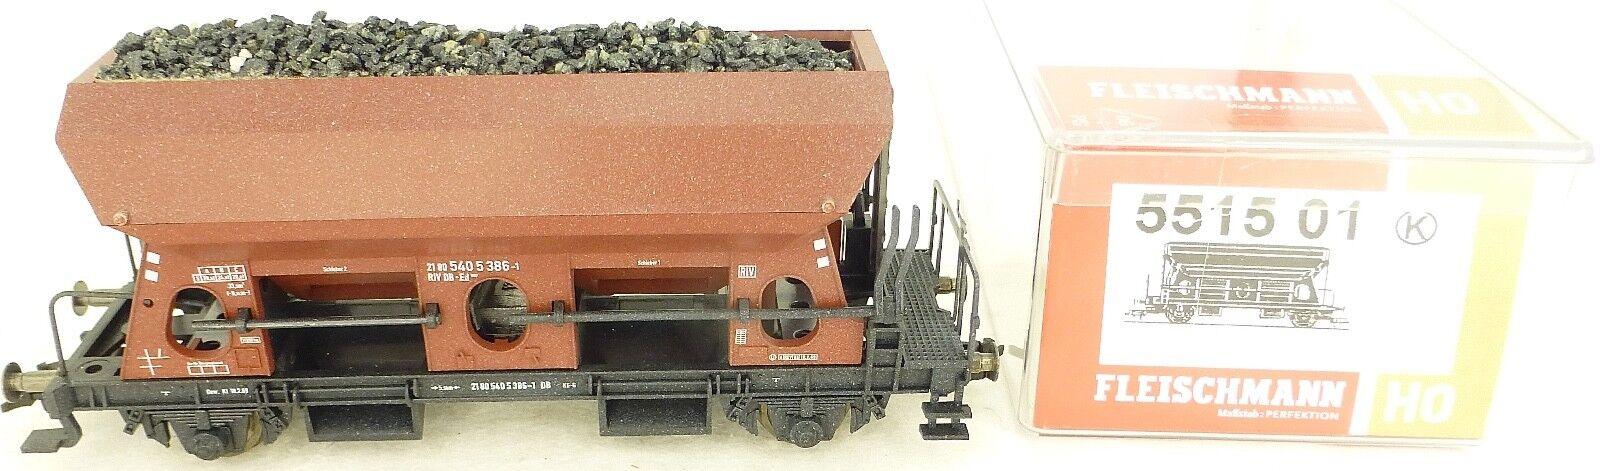 Fleischmann 551501 Goods Wagon Open Model FC Brown DB Ep. III h0 1 87